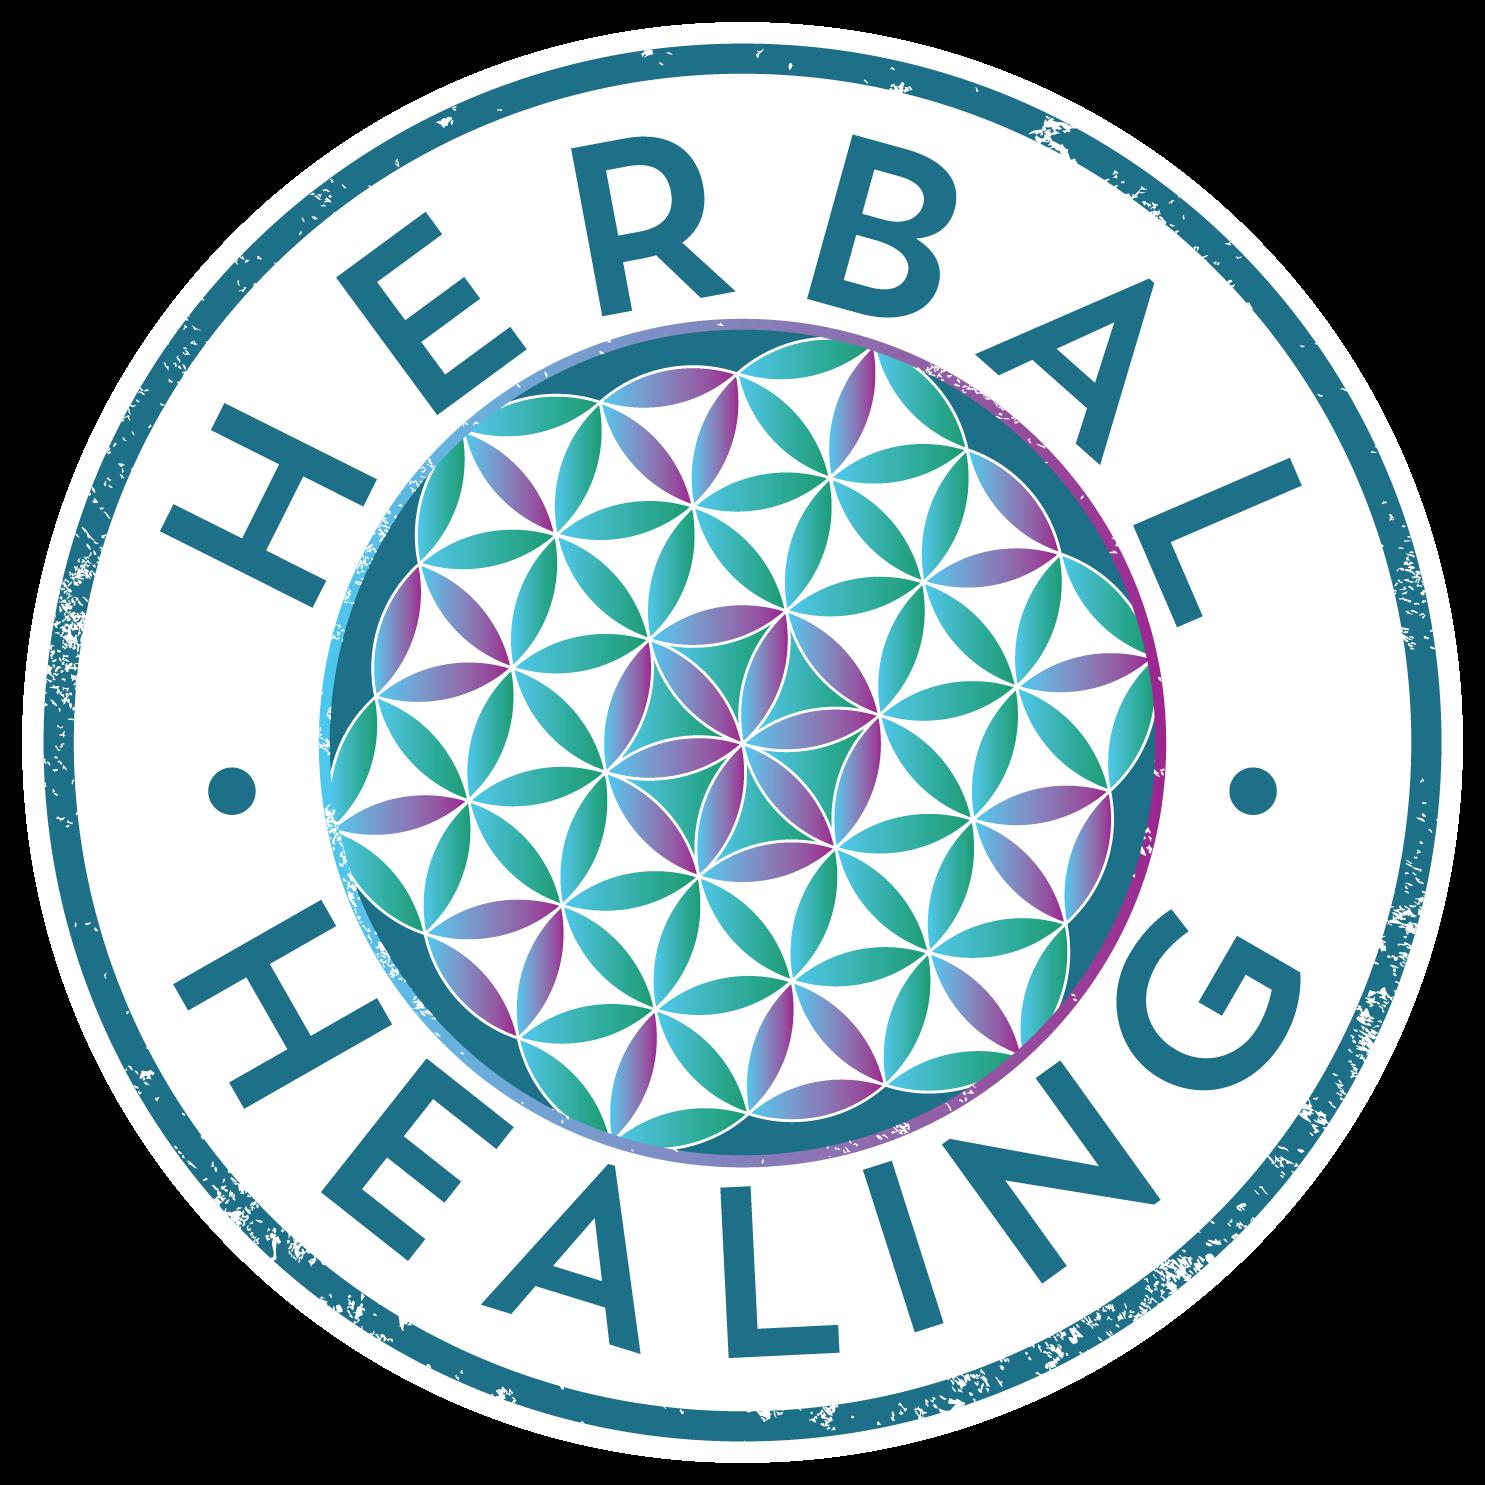 Herbal Healing LLC